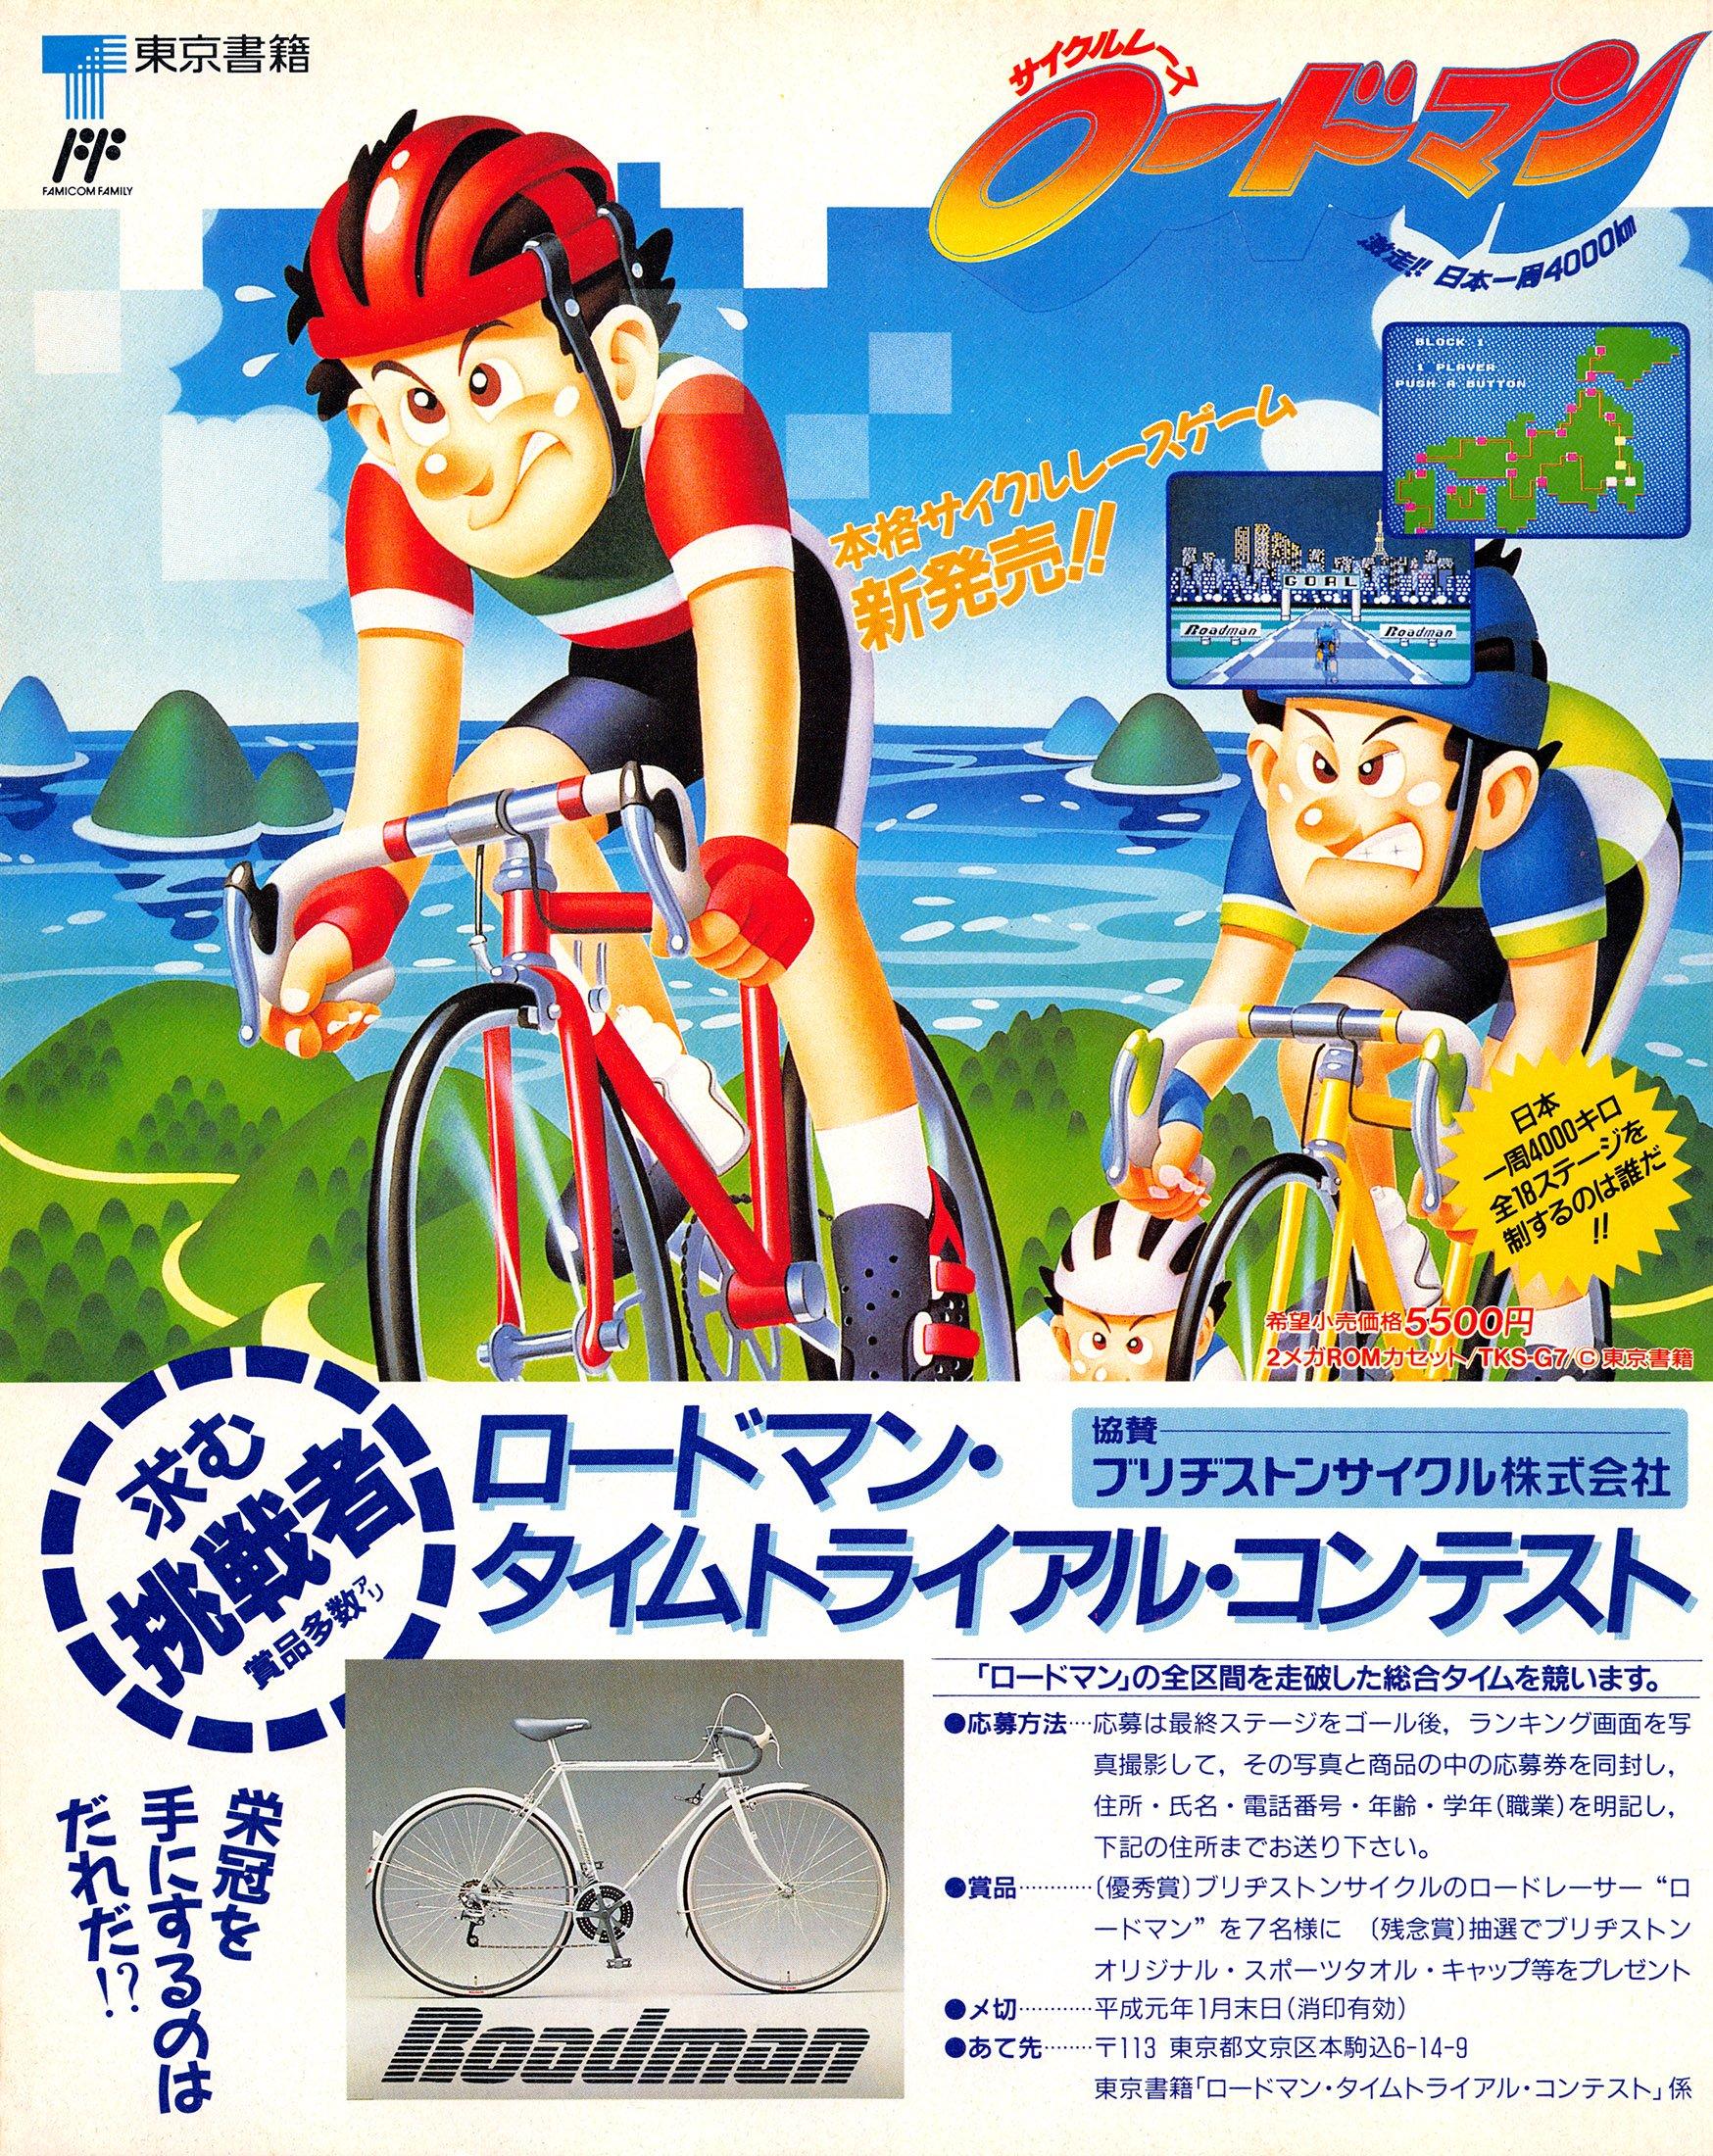 Cycle Race: Road Man (Japan)